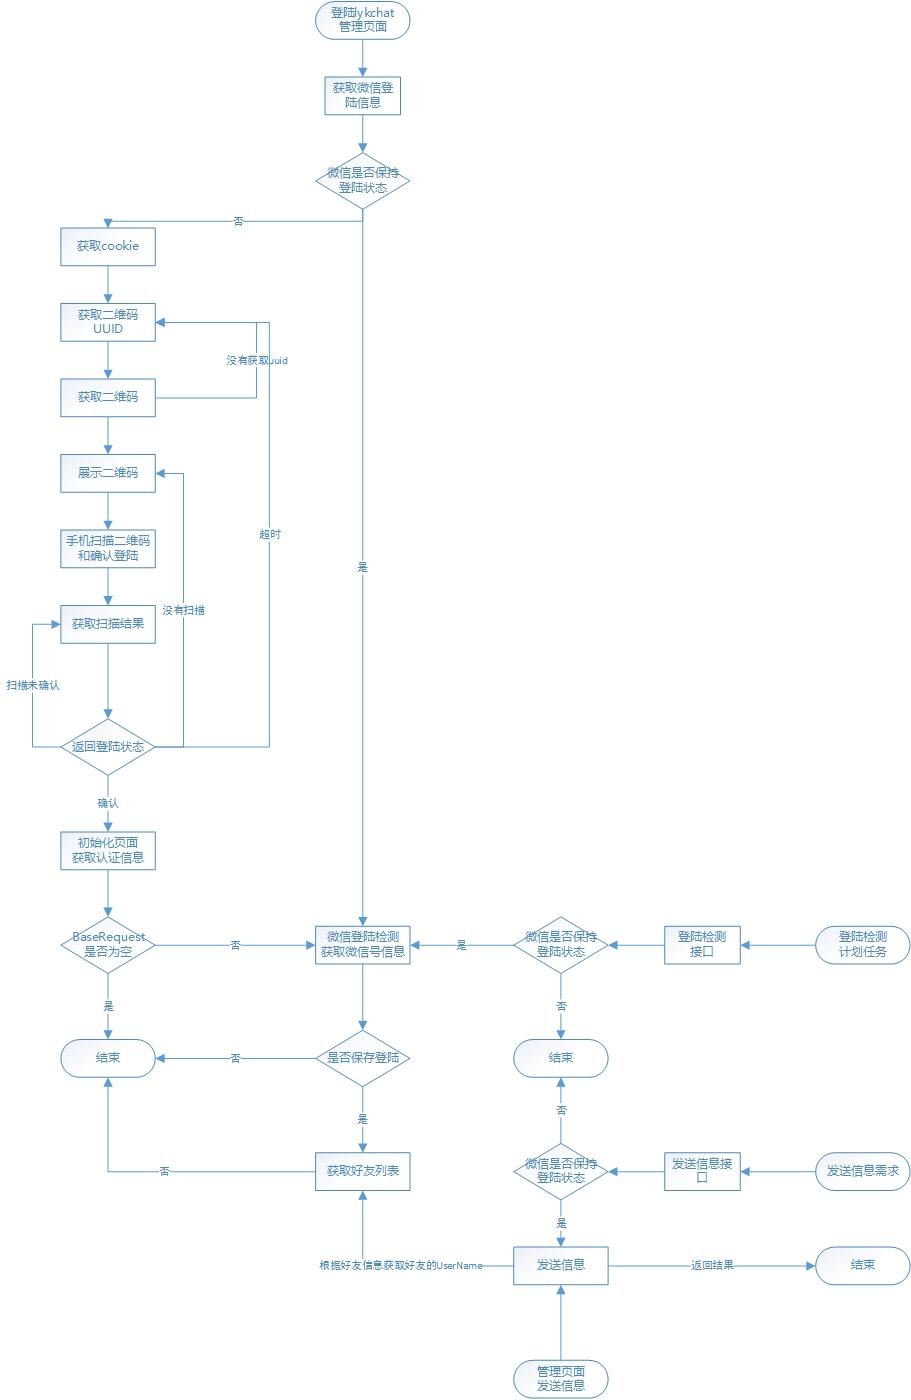 lykchat信息发送系统流程图